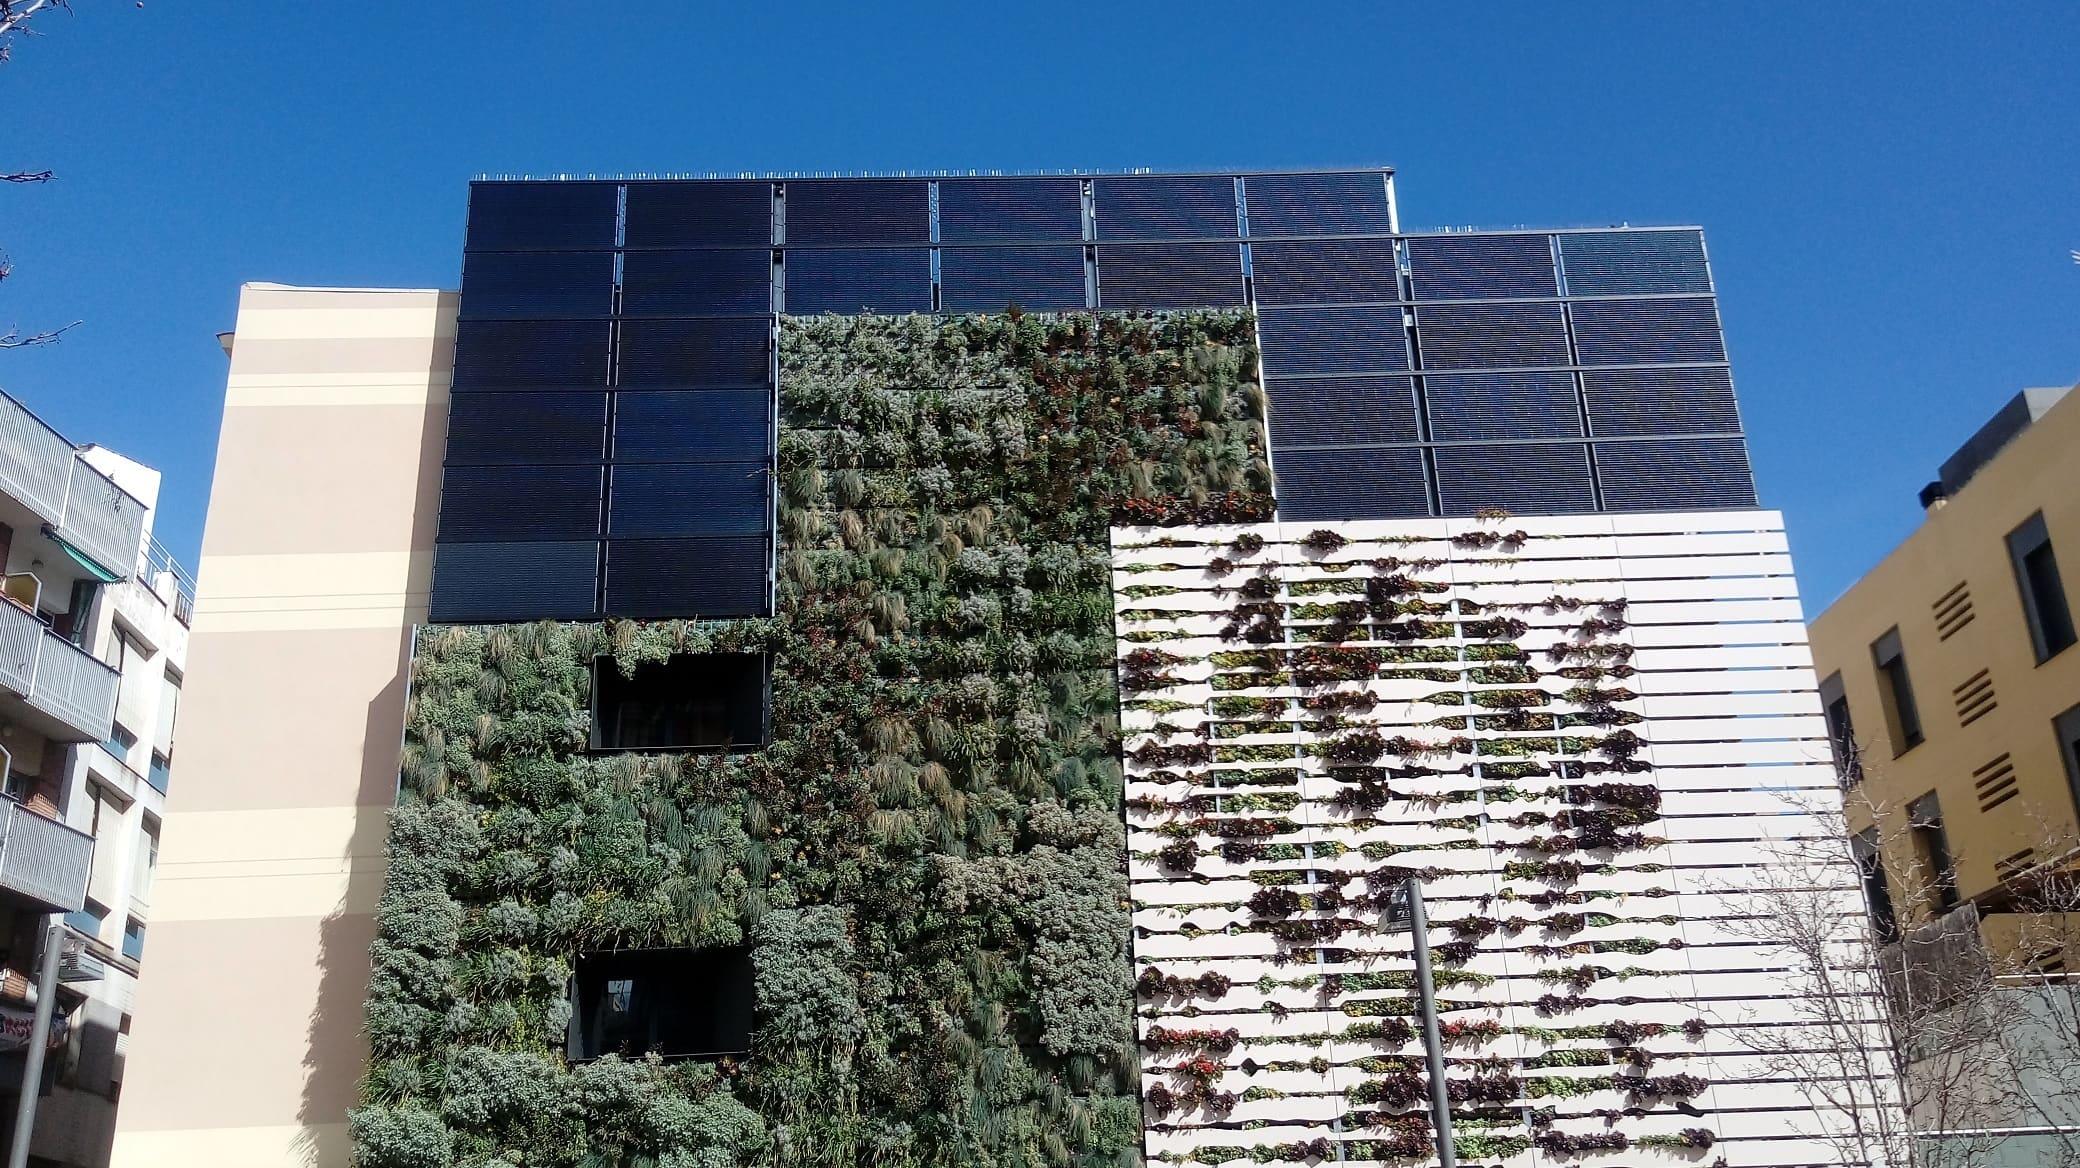 Photovoltaic installation integrated into the facade